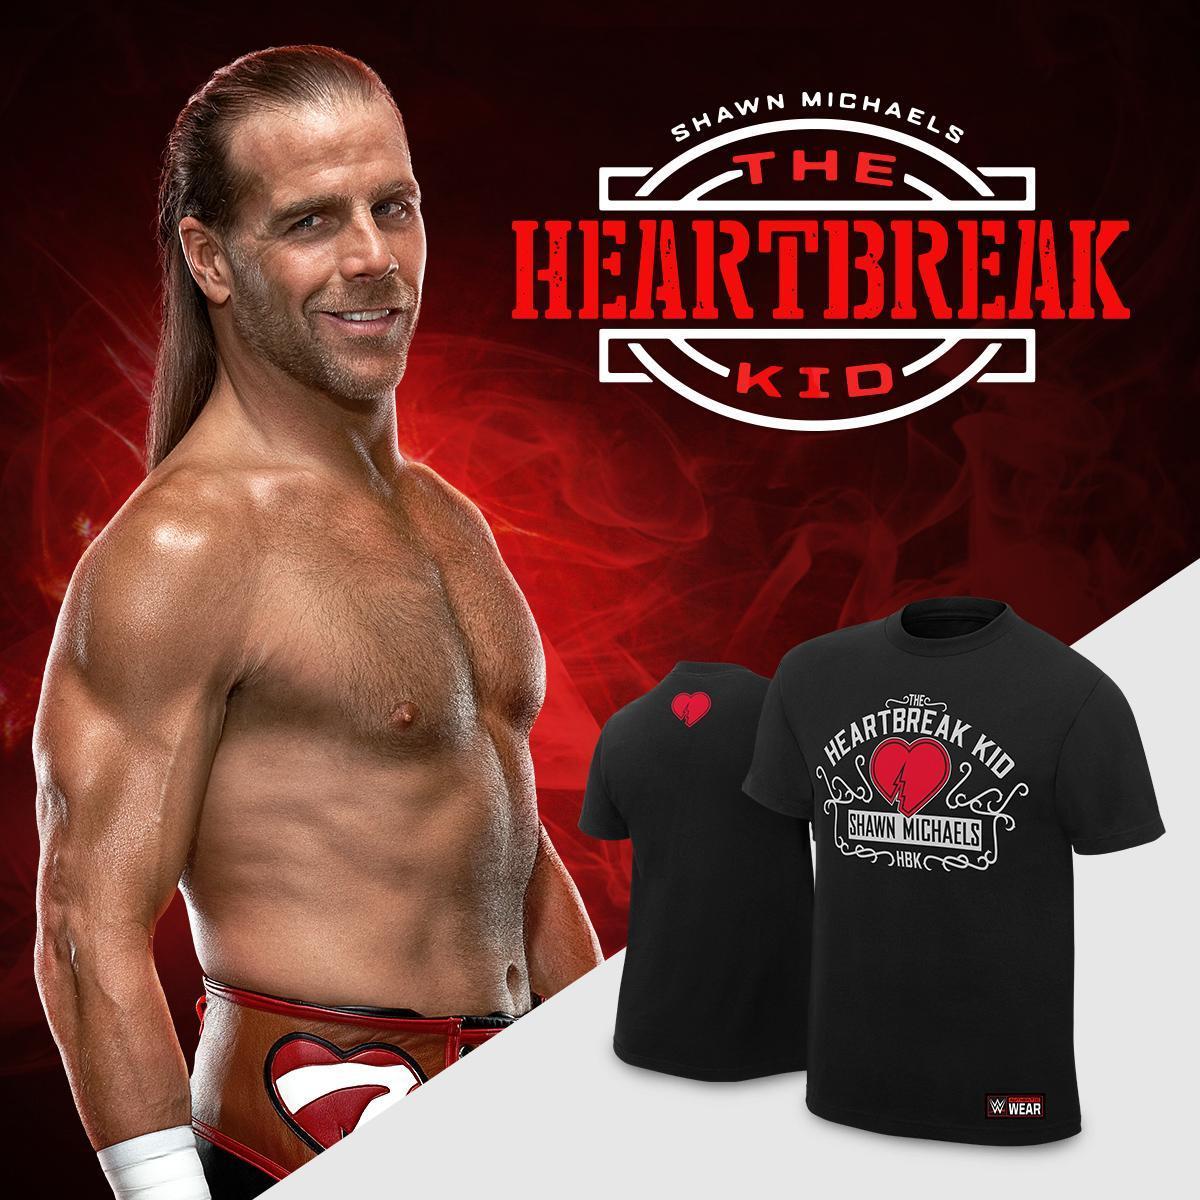 87c1b0242 WWEShop.com on Twitter: